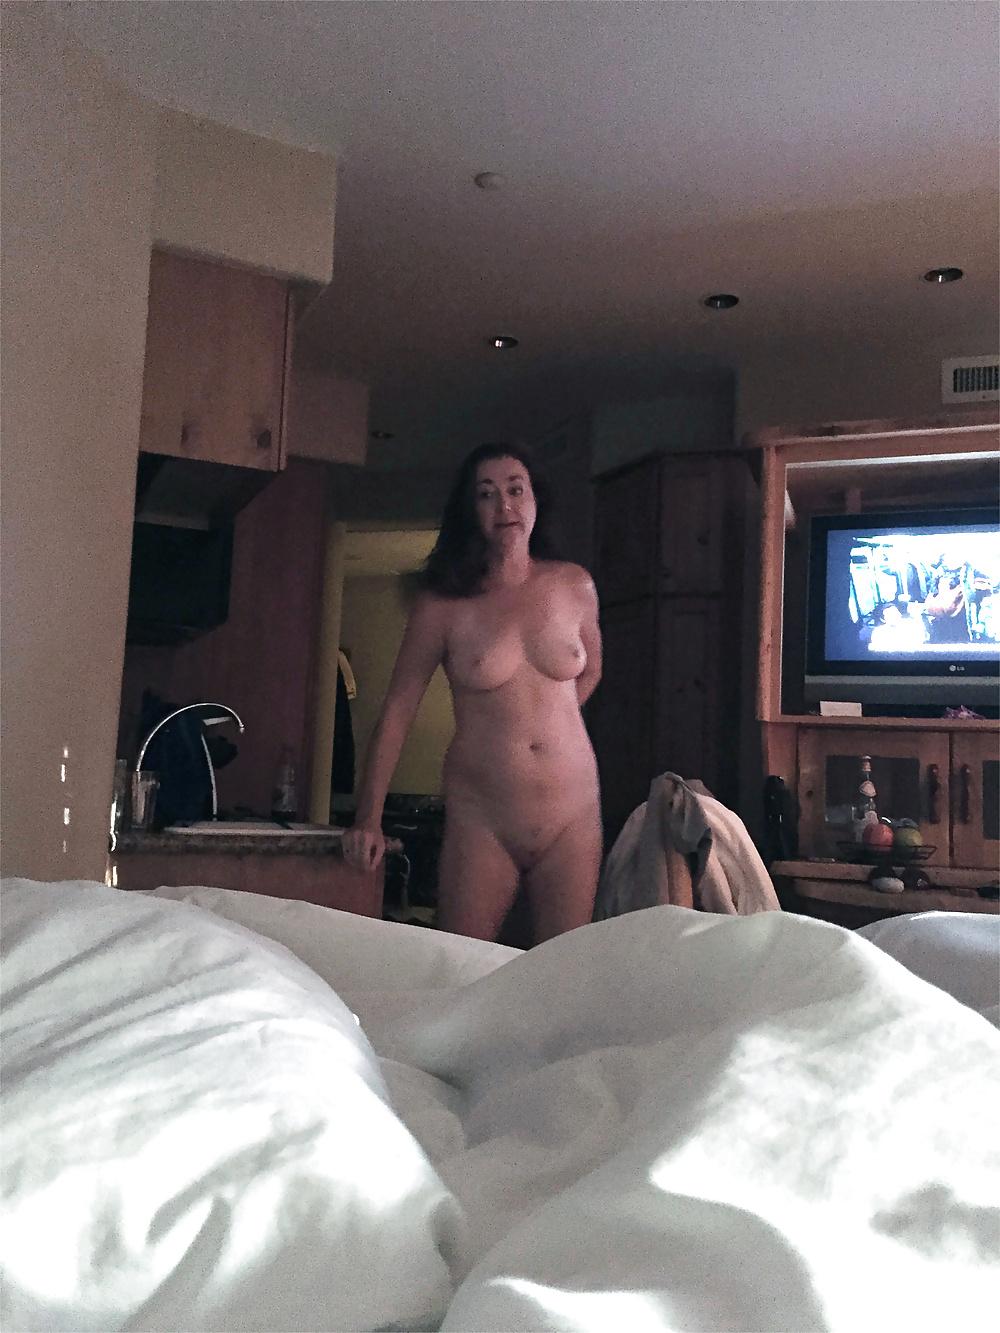 Embarrassed Nude Milf Hotel Room